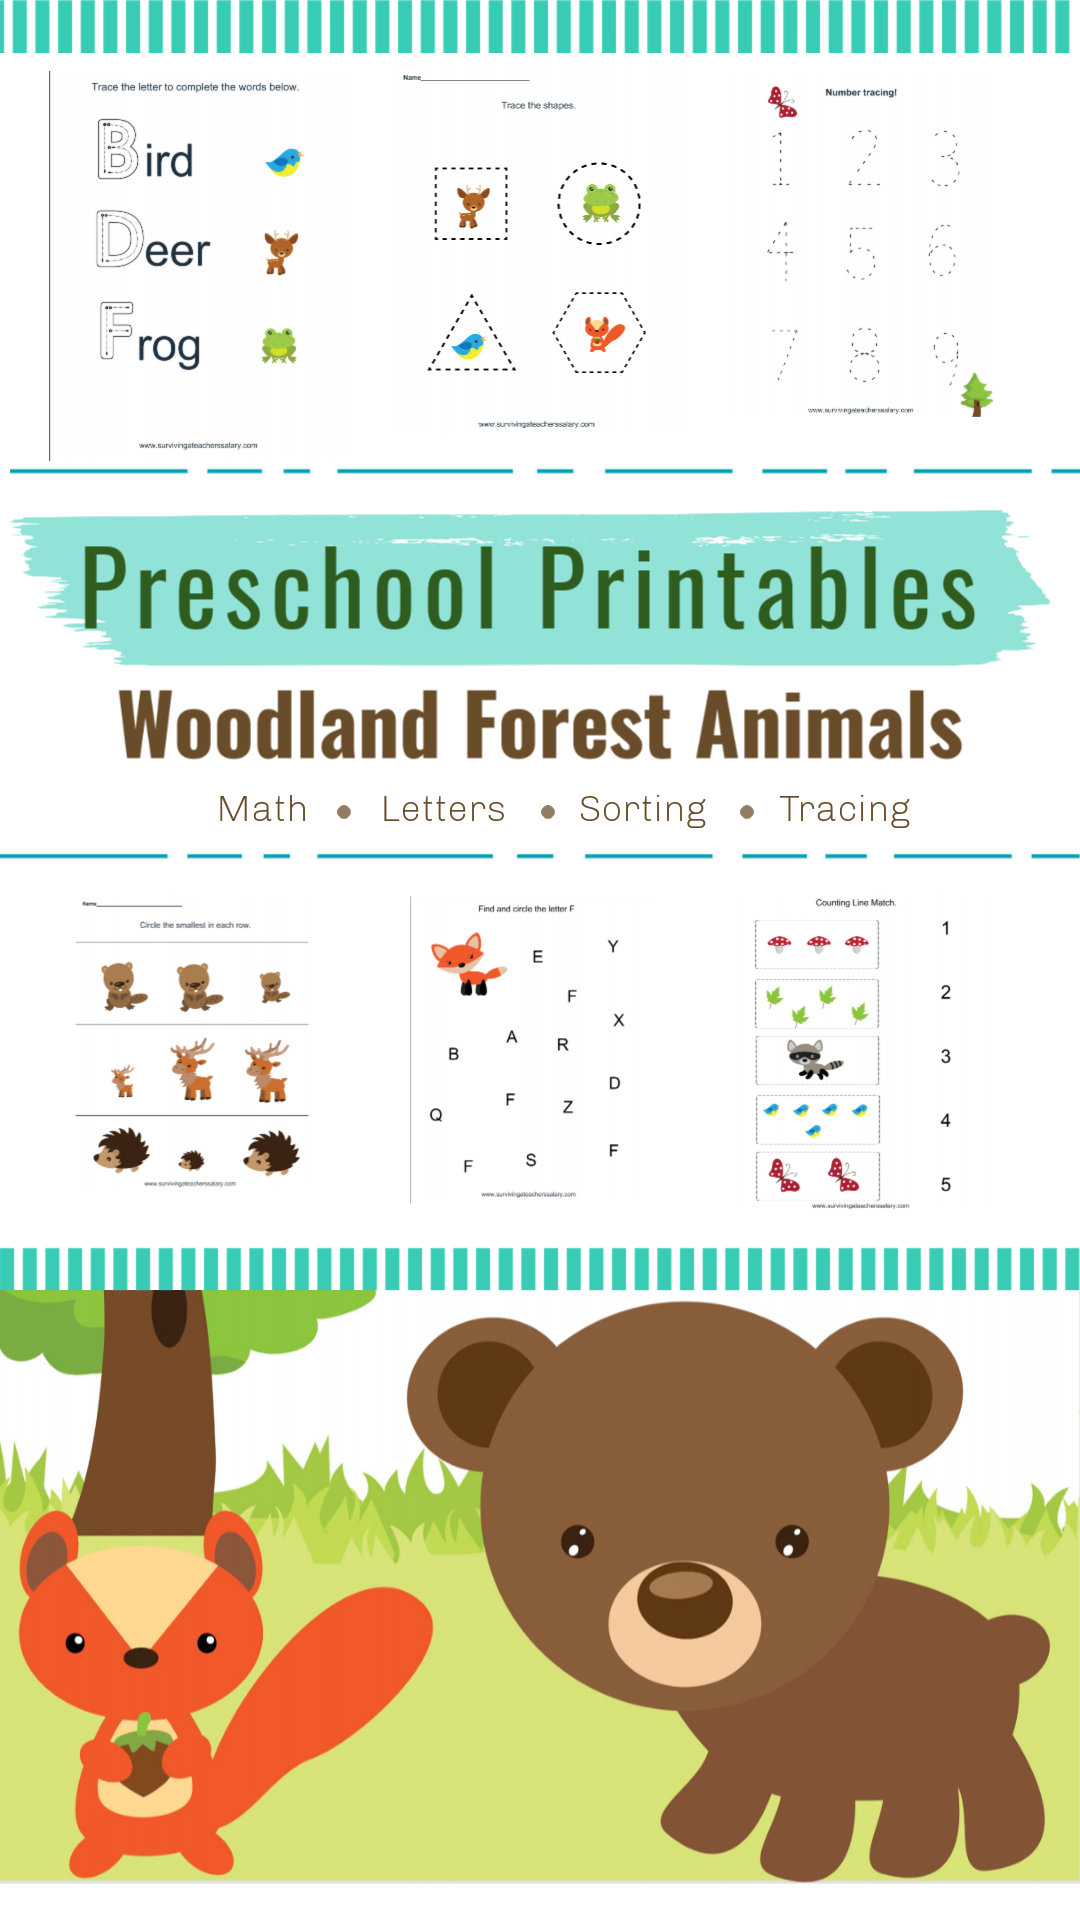 Woodlands Forest Friends Printable Preschool Set Free Preschool Printables Preschool Learning Worksheets [ 1920 x 1080 Pixel ]